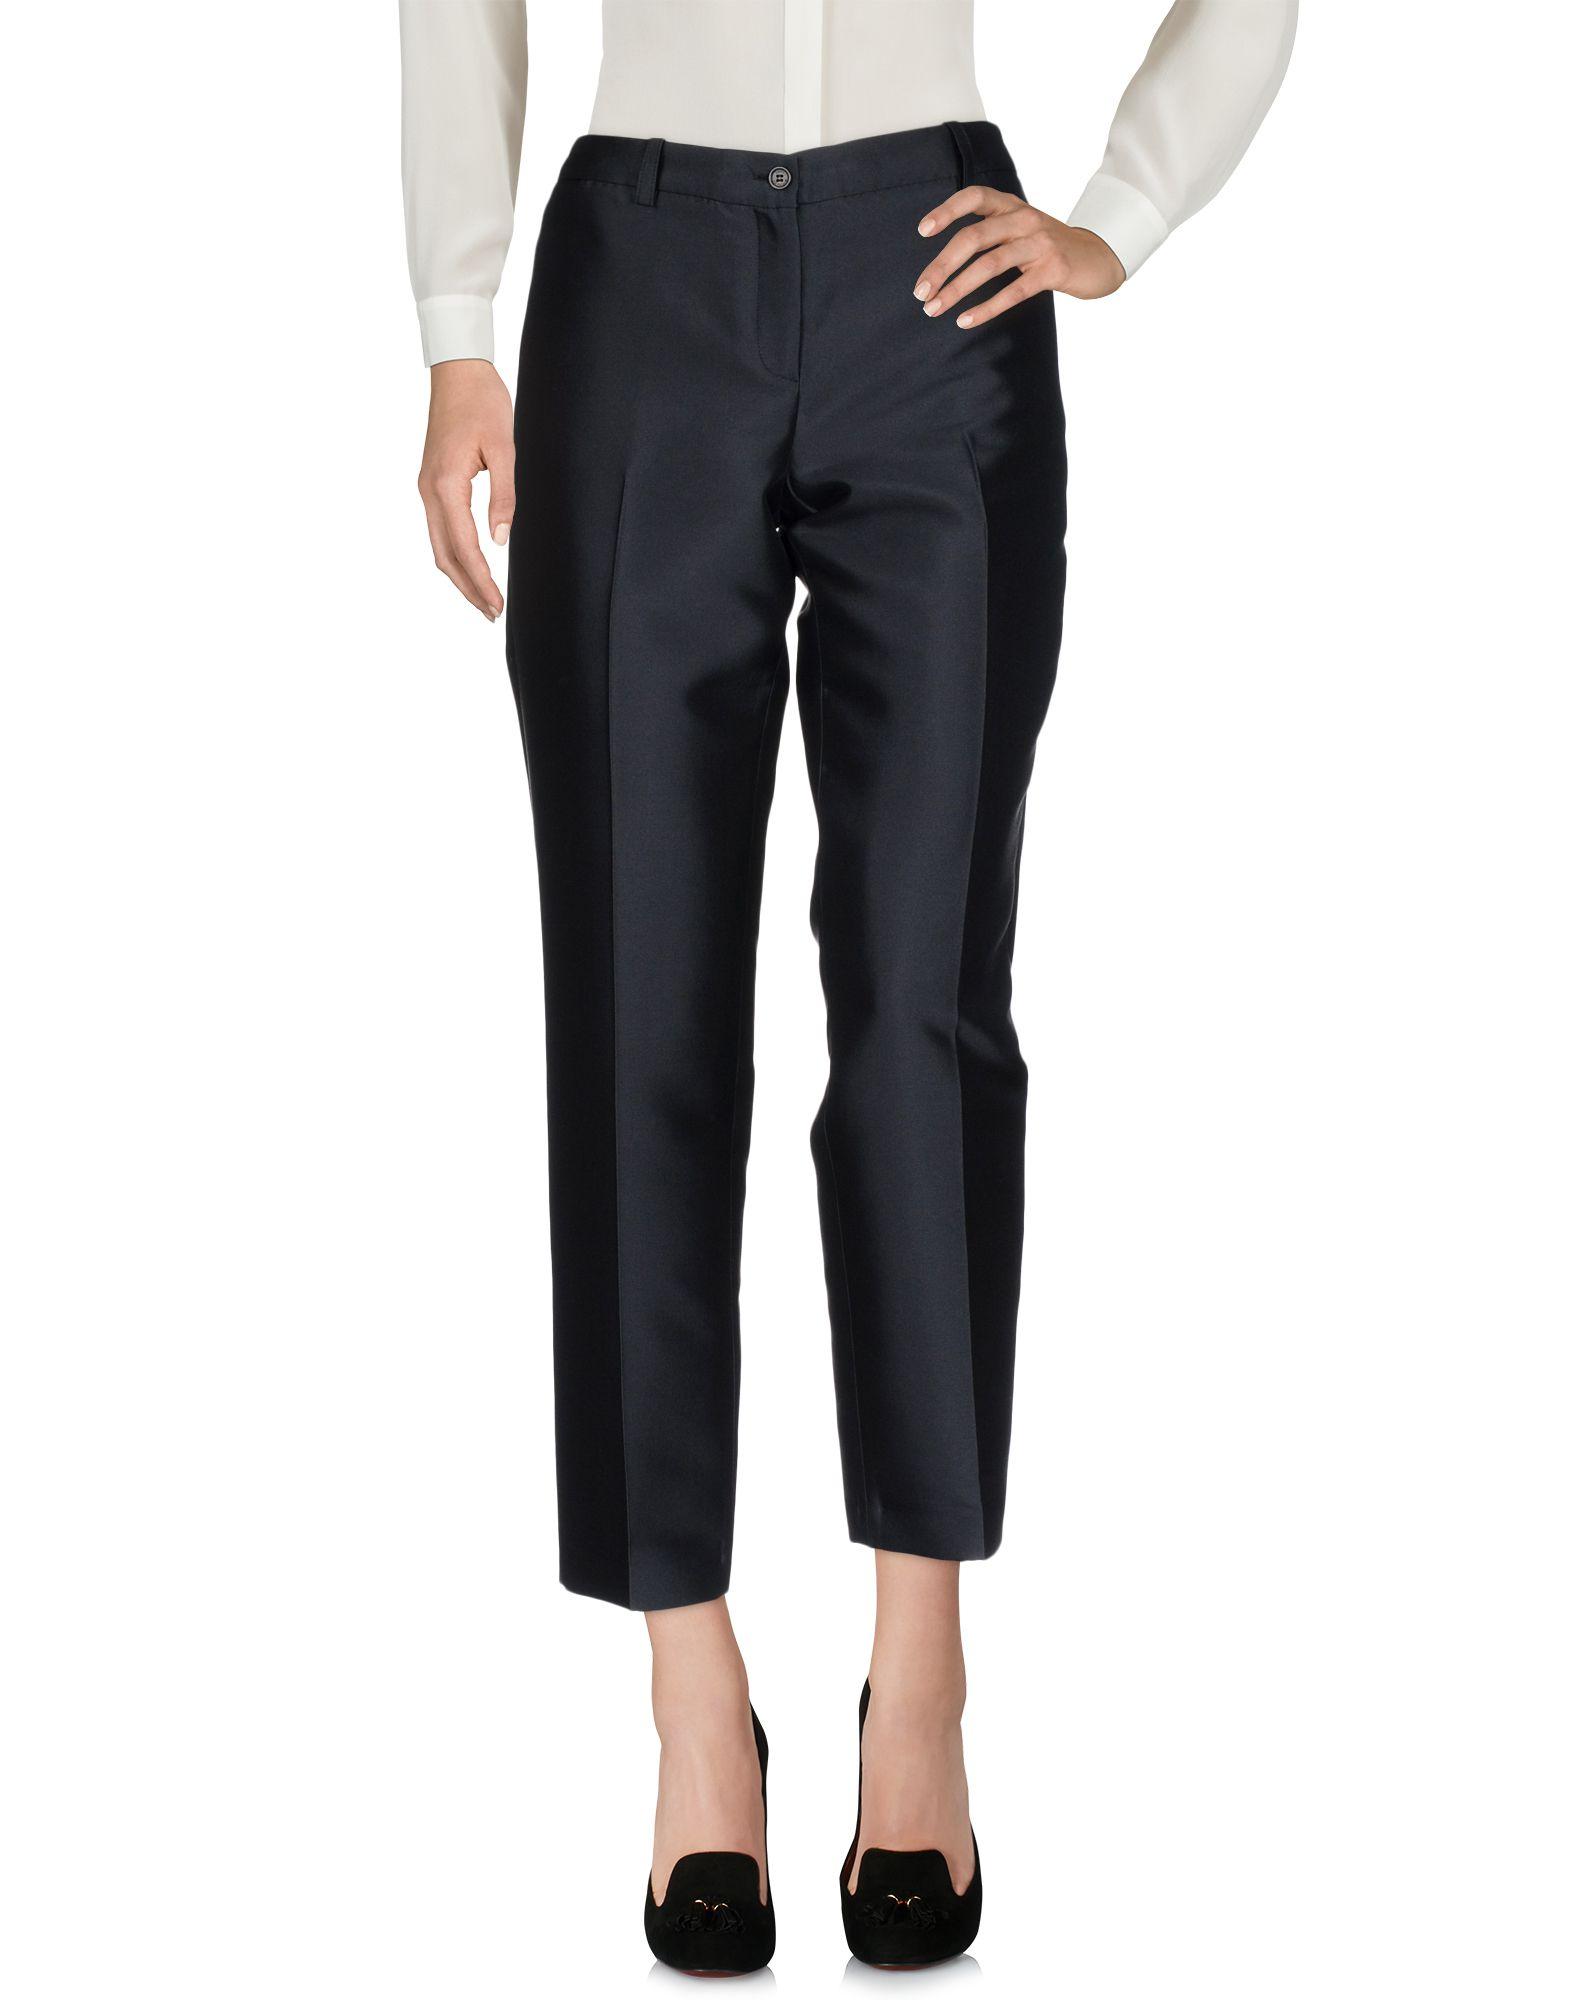 Pantalone Michael Kors Donna - Acquista online su t99TDm